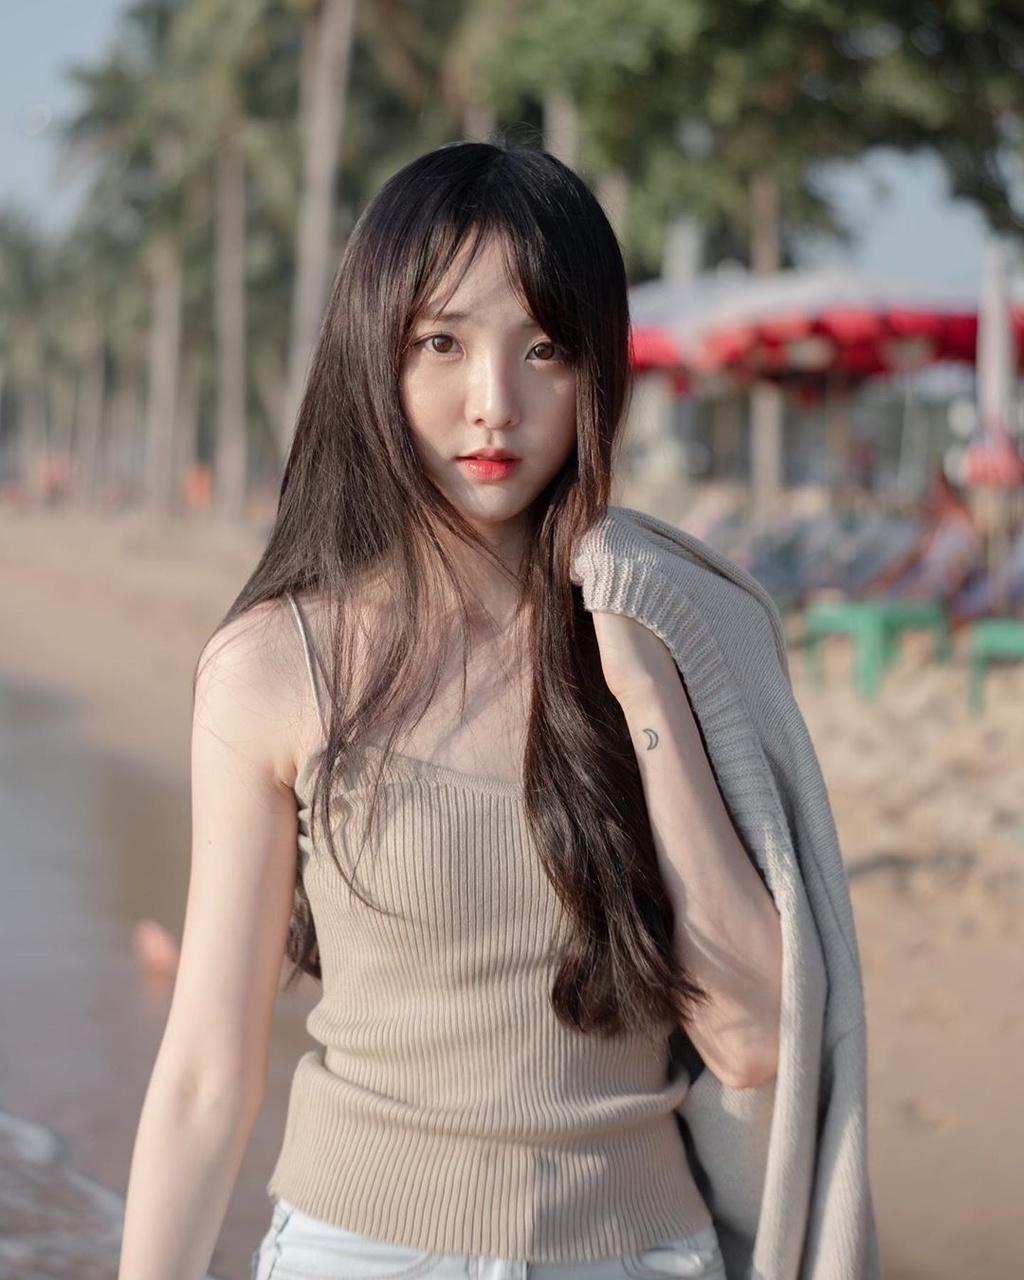 Hot girl 'Lat mat 3' cua Ly Hai tham gia show song con ban Trung hinh anh 10 79369488_586009272228071_1985138672199691985_n.jpg